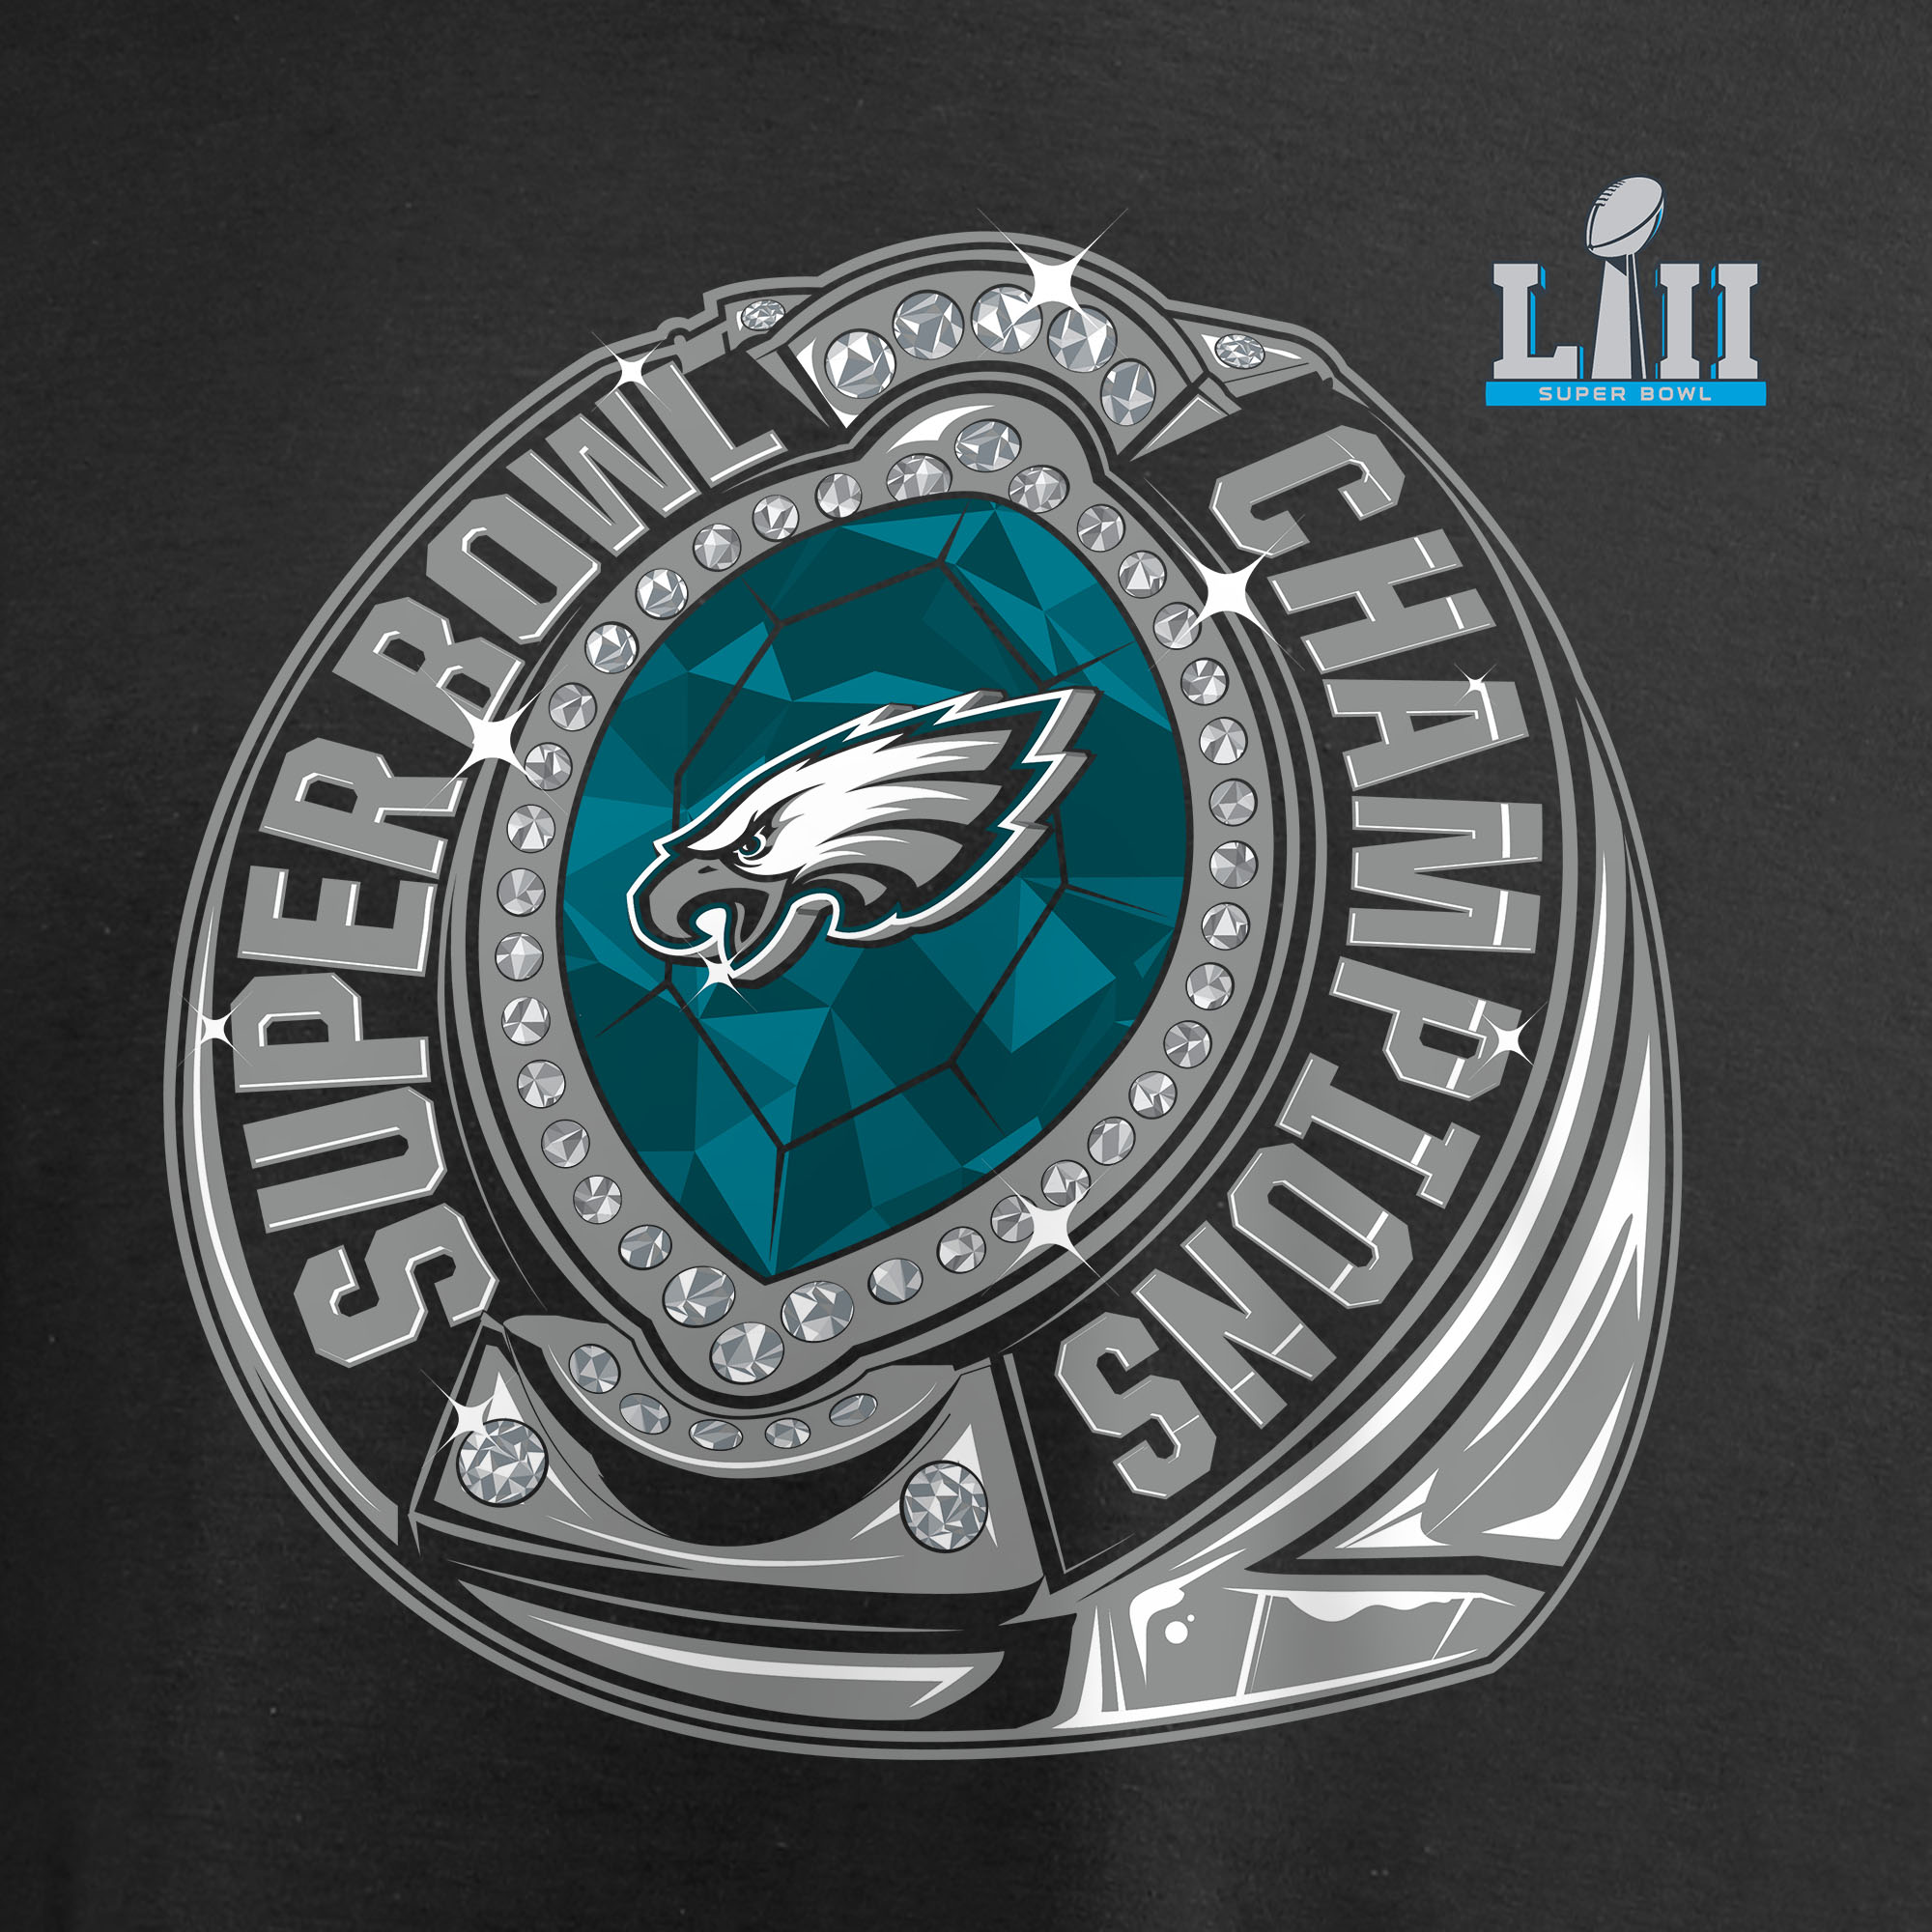 778124ec29d1 Philadelphia Eagles NFL Pro Line by Fanatics Branded Super Bowl LII  Champions Bounce Long Sleeve T-Shirt - Black - Walmart.com